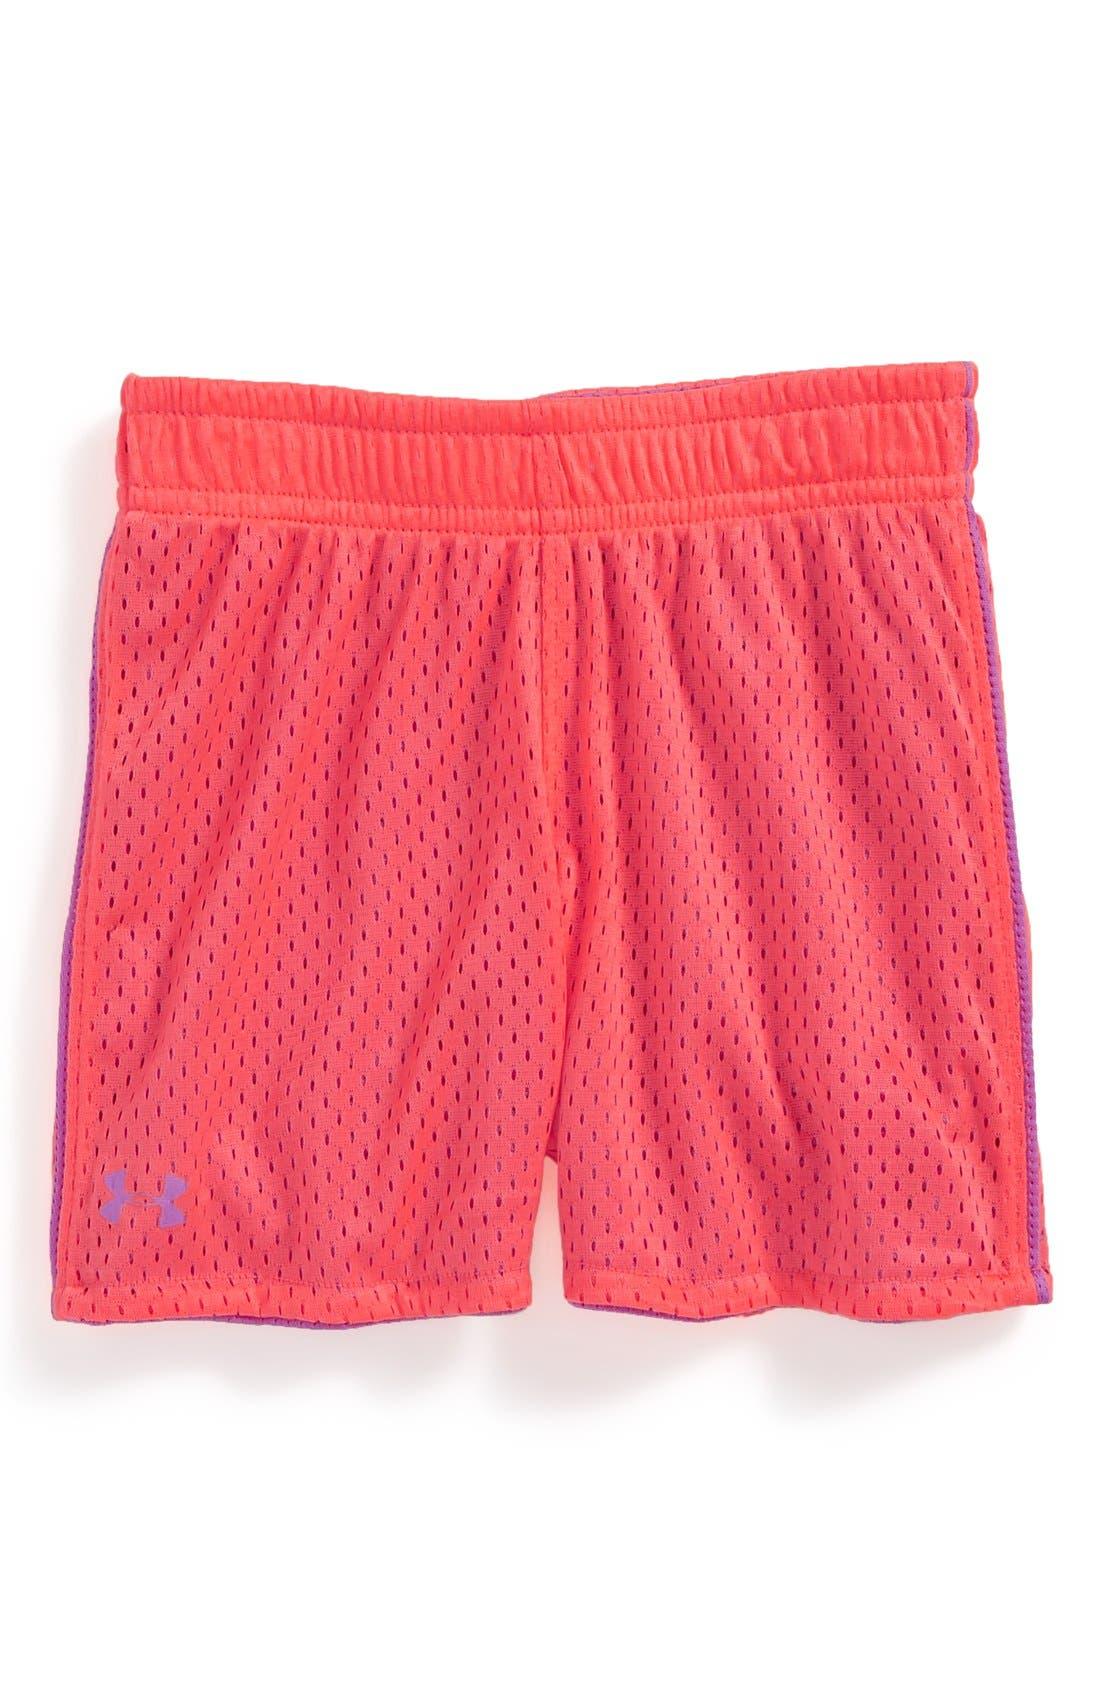 Alternate Image 1 Selected - Under Armour Reversible Mesh Shorts (Toddler Girls)